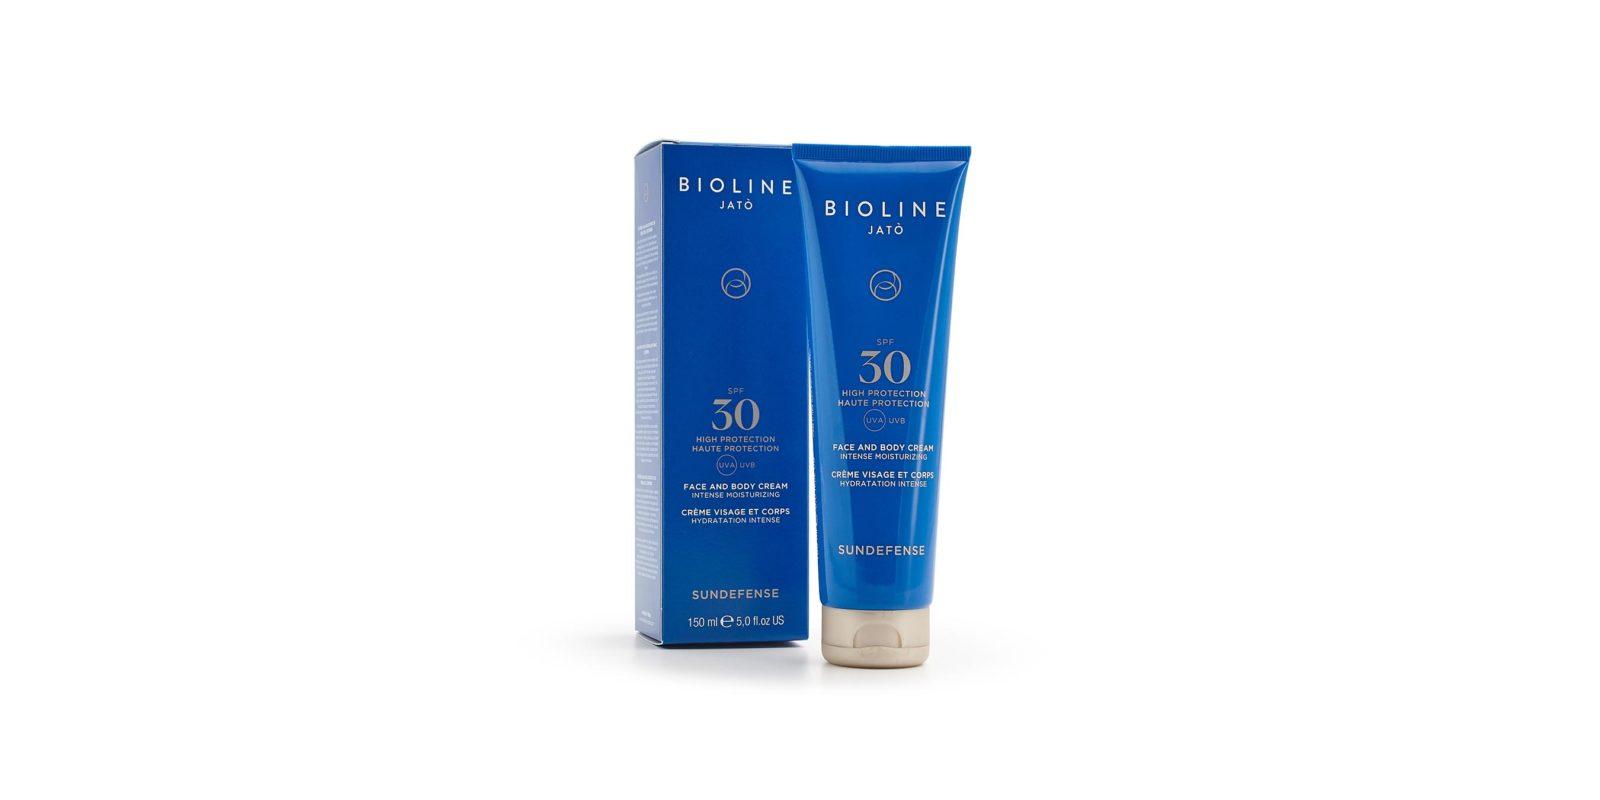 Bioline Jatò Sundefense Hight Protection Cream